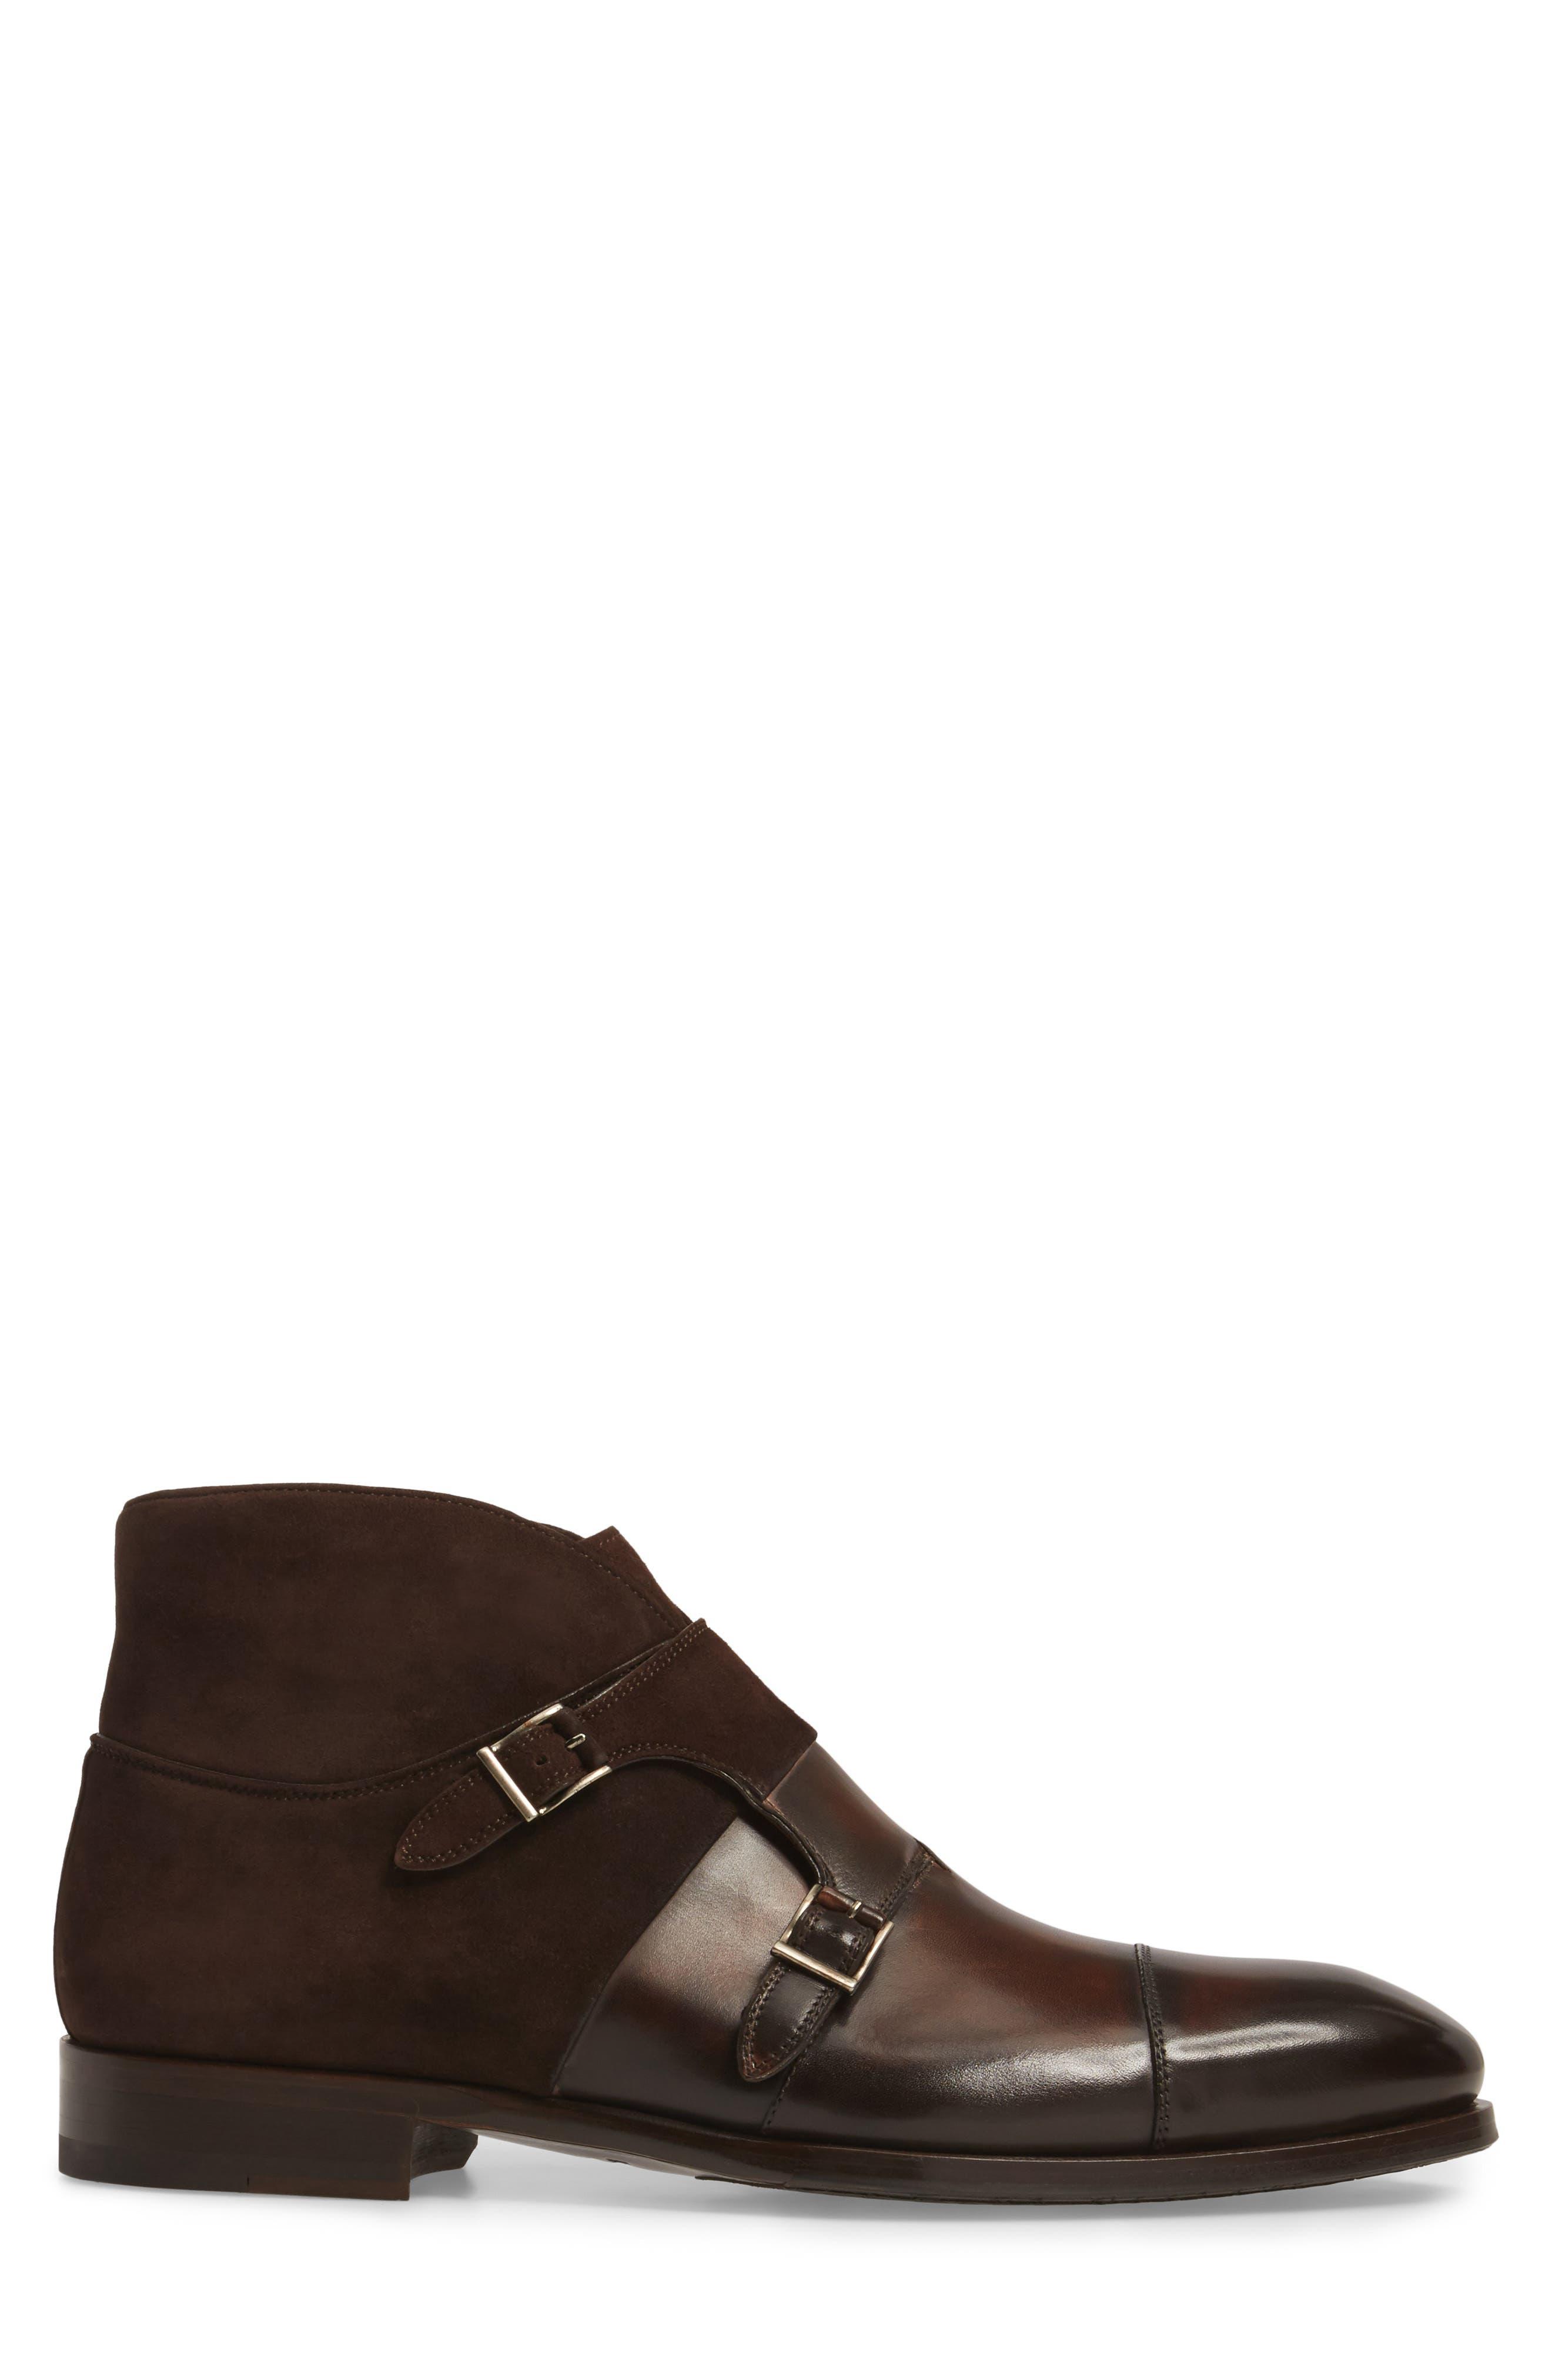 Octavian Double Monk Strap Boot,                             Alternate thumbnail 3, color,                             200